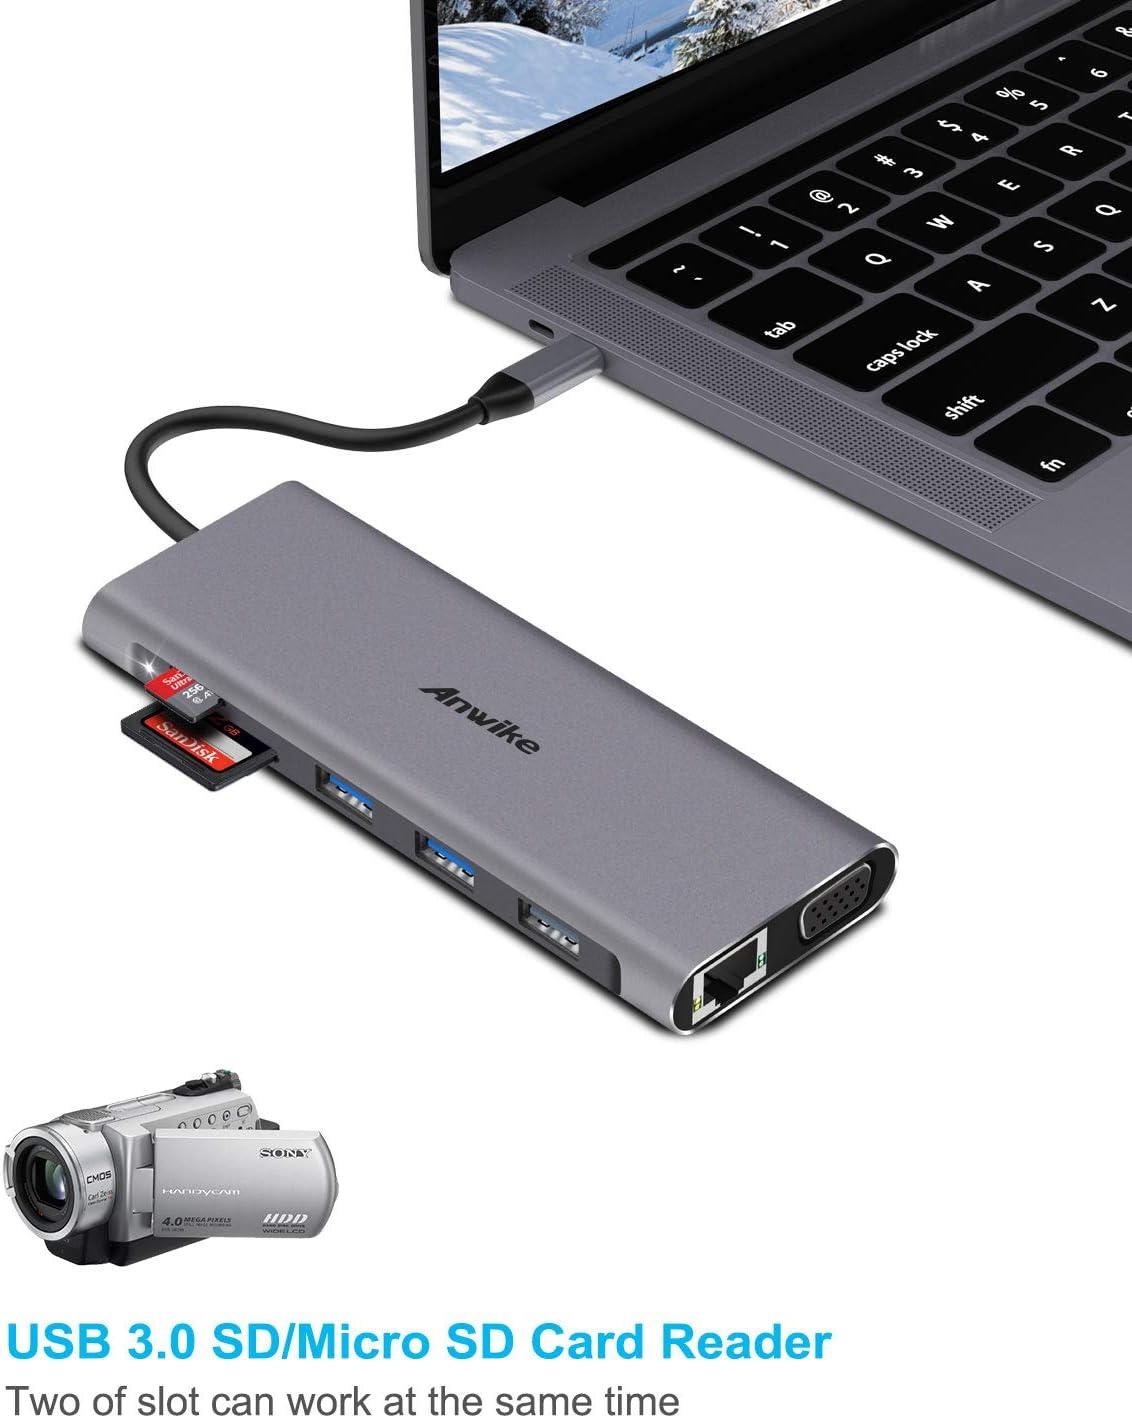 Gigabit Ethernet Docking 12 in 1 Type C Hub Triple Display Adapter for Thunderbolt3 USB C Devices 2HDMI 4K Audio VGA 4USB Ports,SD//TF Card Reader USB C HUB,ANWIKE USB C Laptop Docking Station